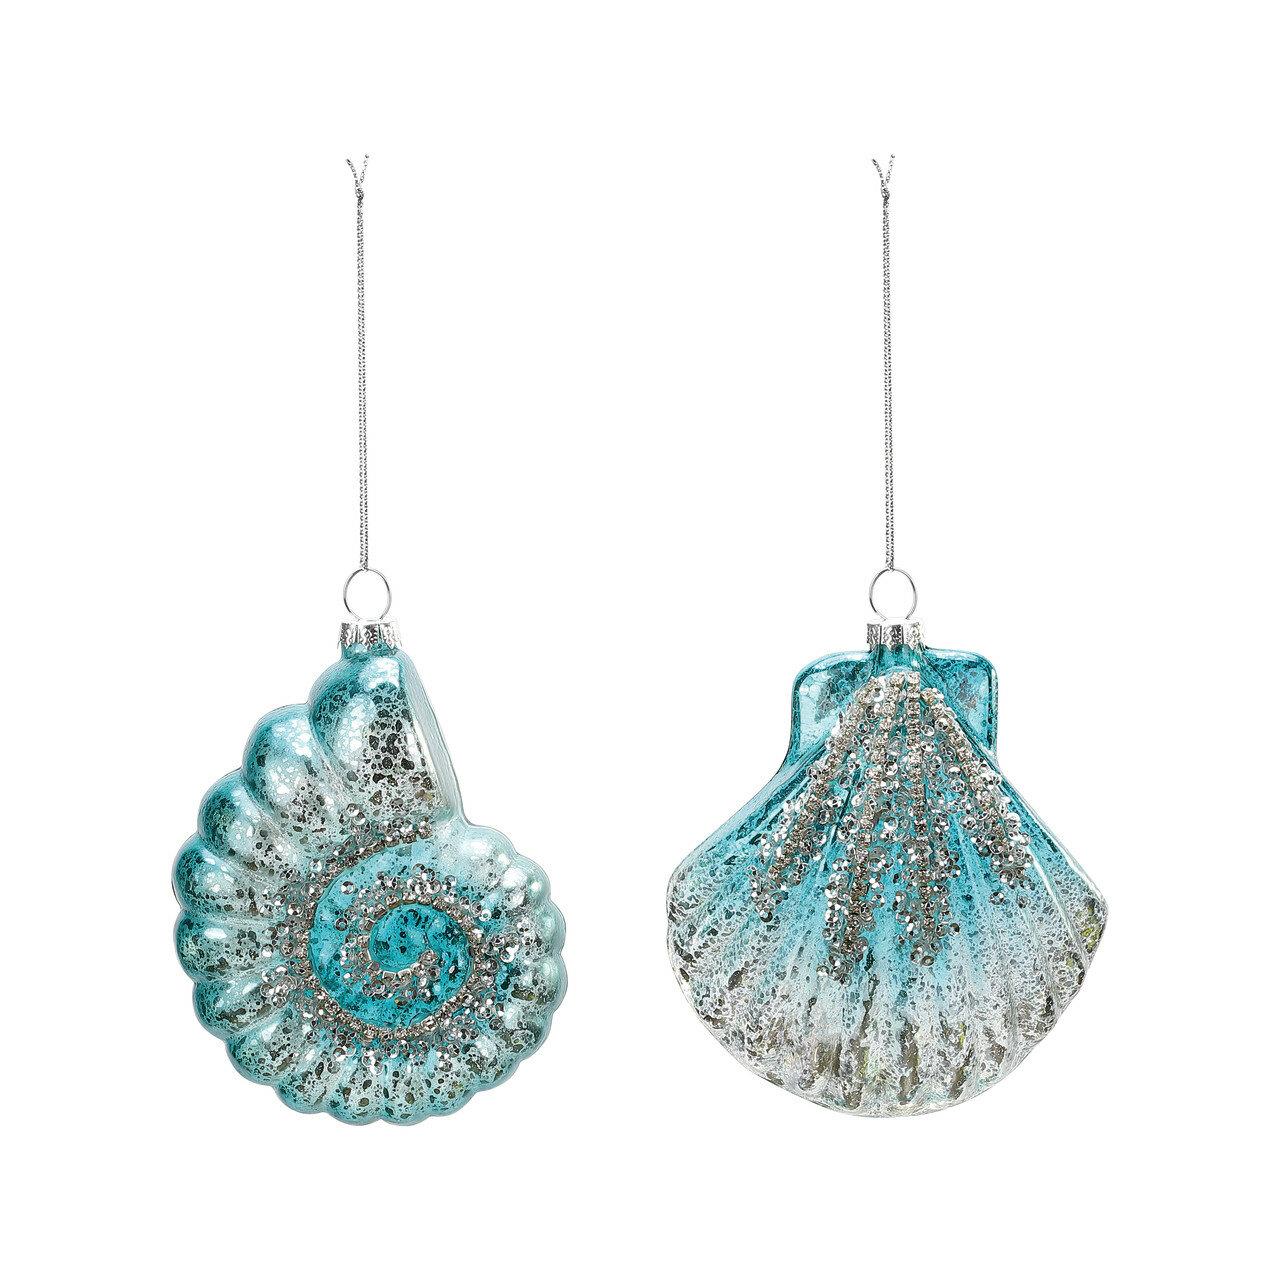 The Holiday Aisle 2 Piece Seashell Hanging Figurine Ornament Set Reviews Wayfair